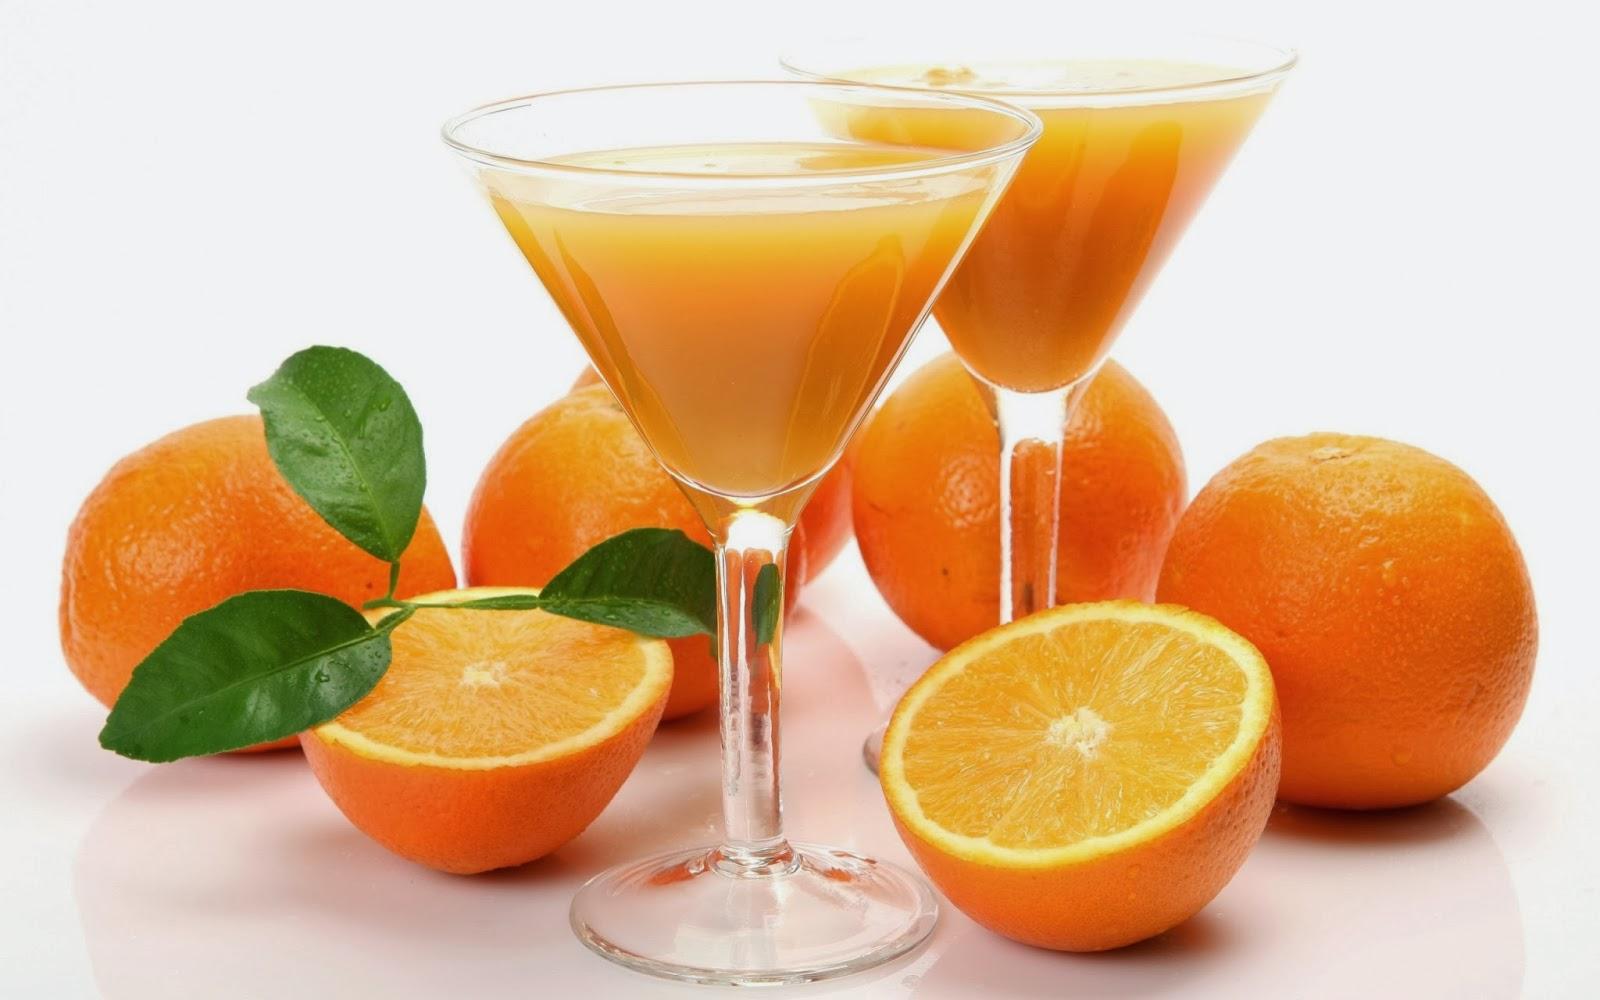 Orange - The Source Of Vitamin C & Cryptoxanthin